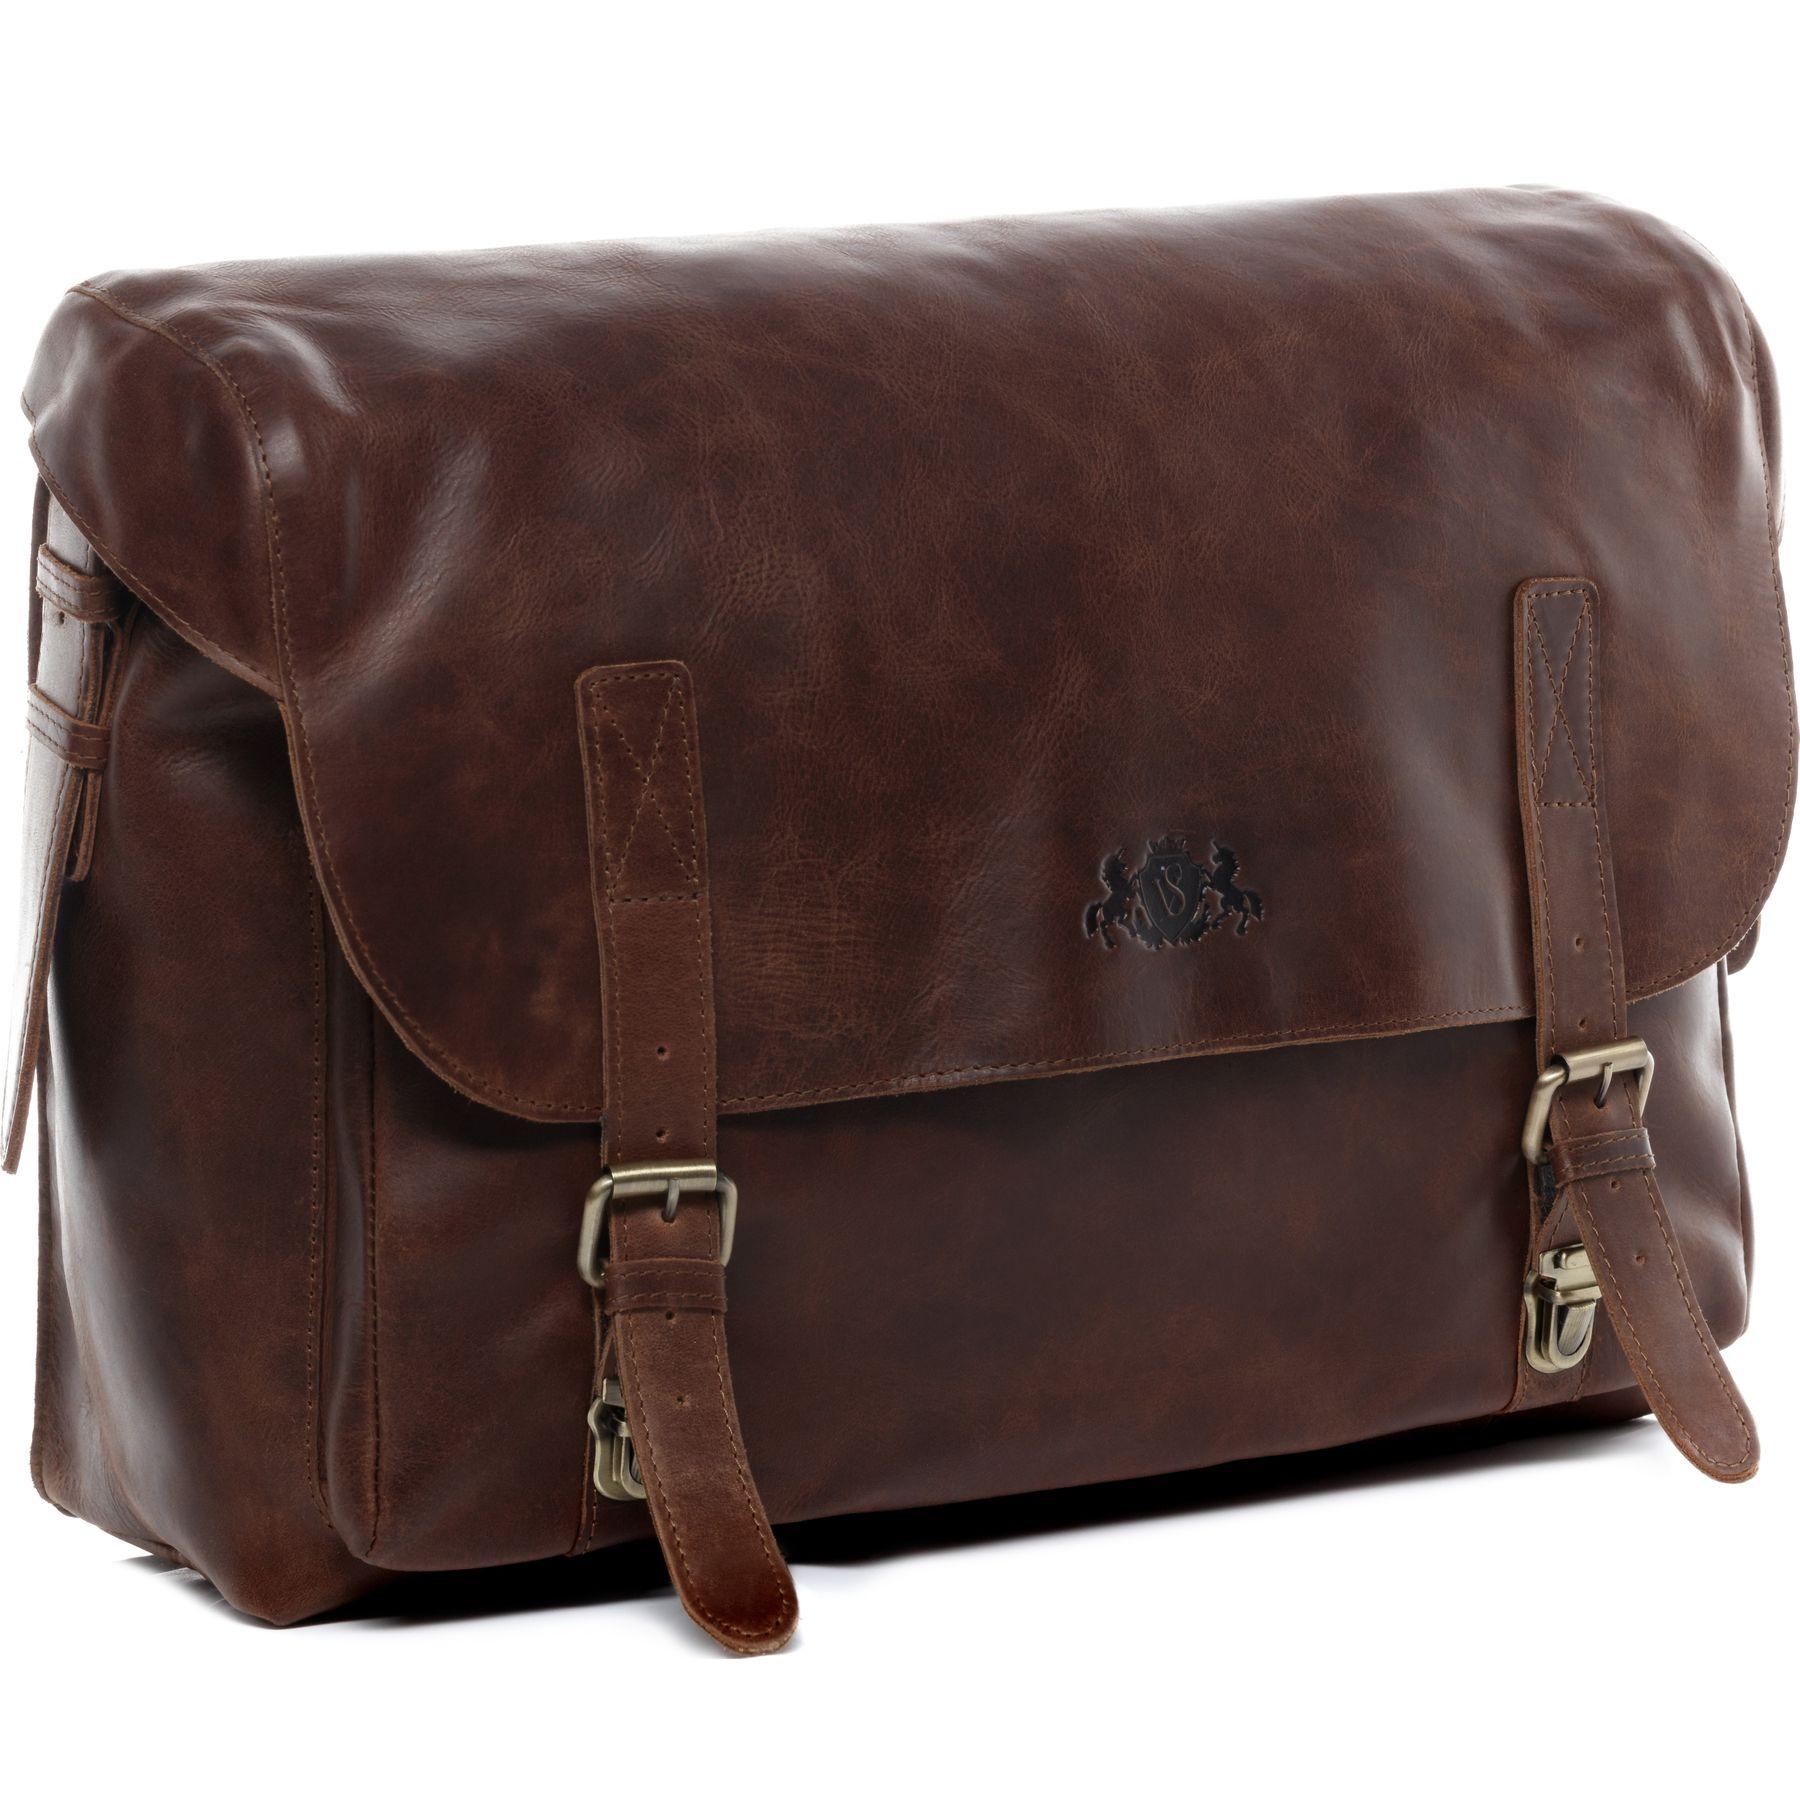 8170ea191 SID & VAIN briefcase Natural Leather ETON brown-cognac office laptop ...